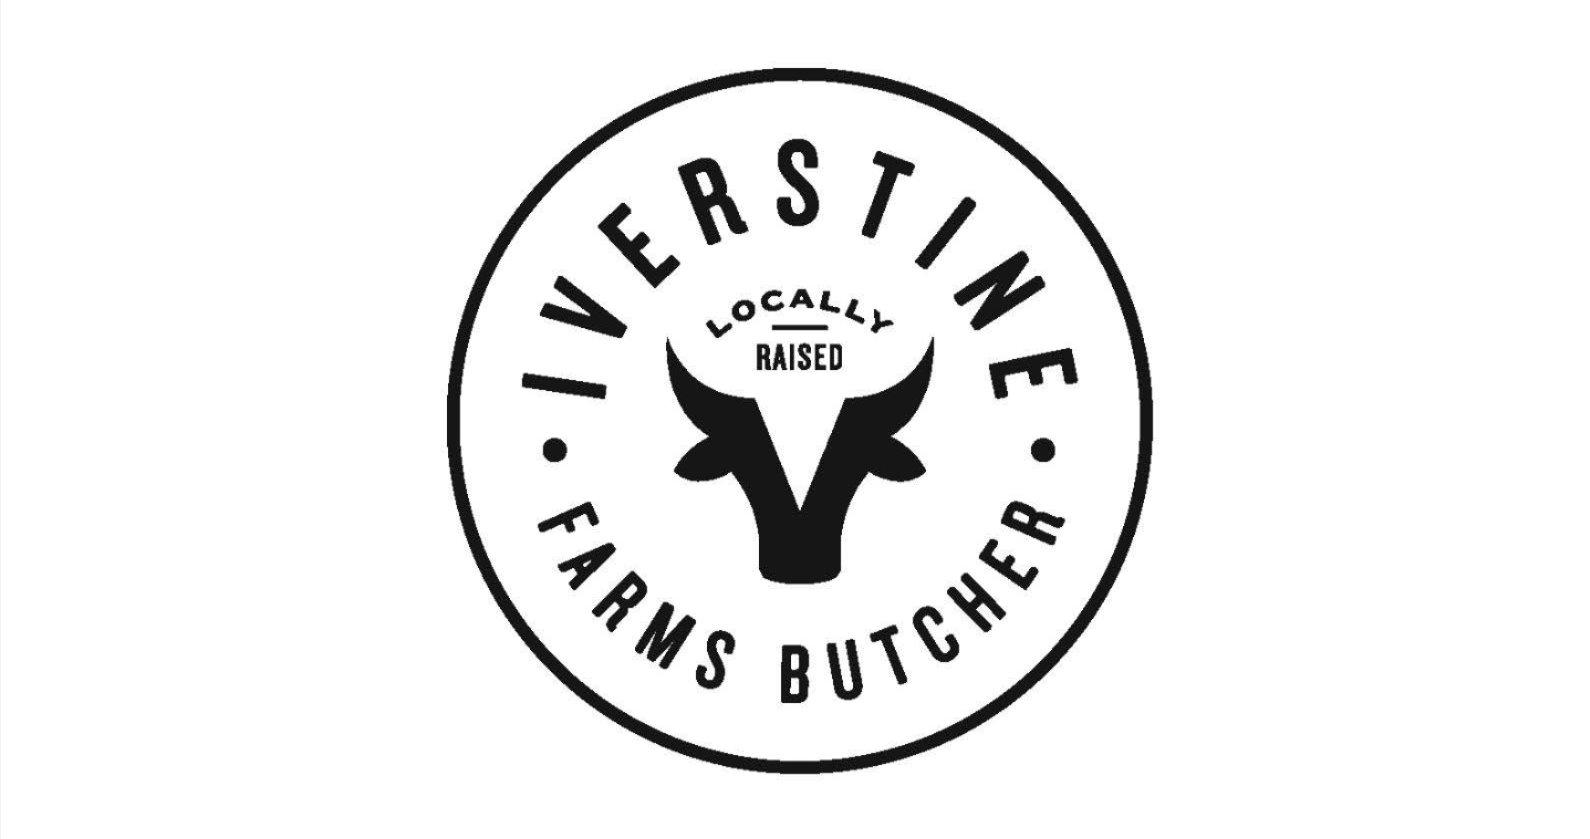 Iverstine Farms Butcher